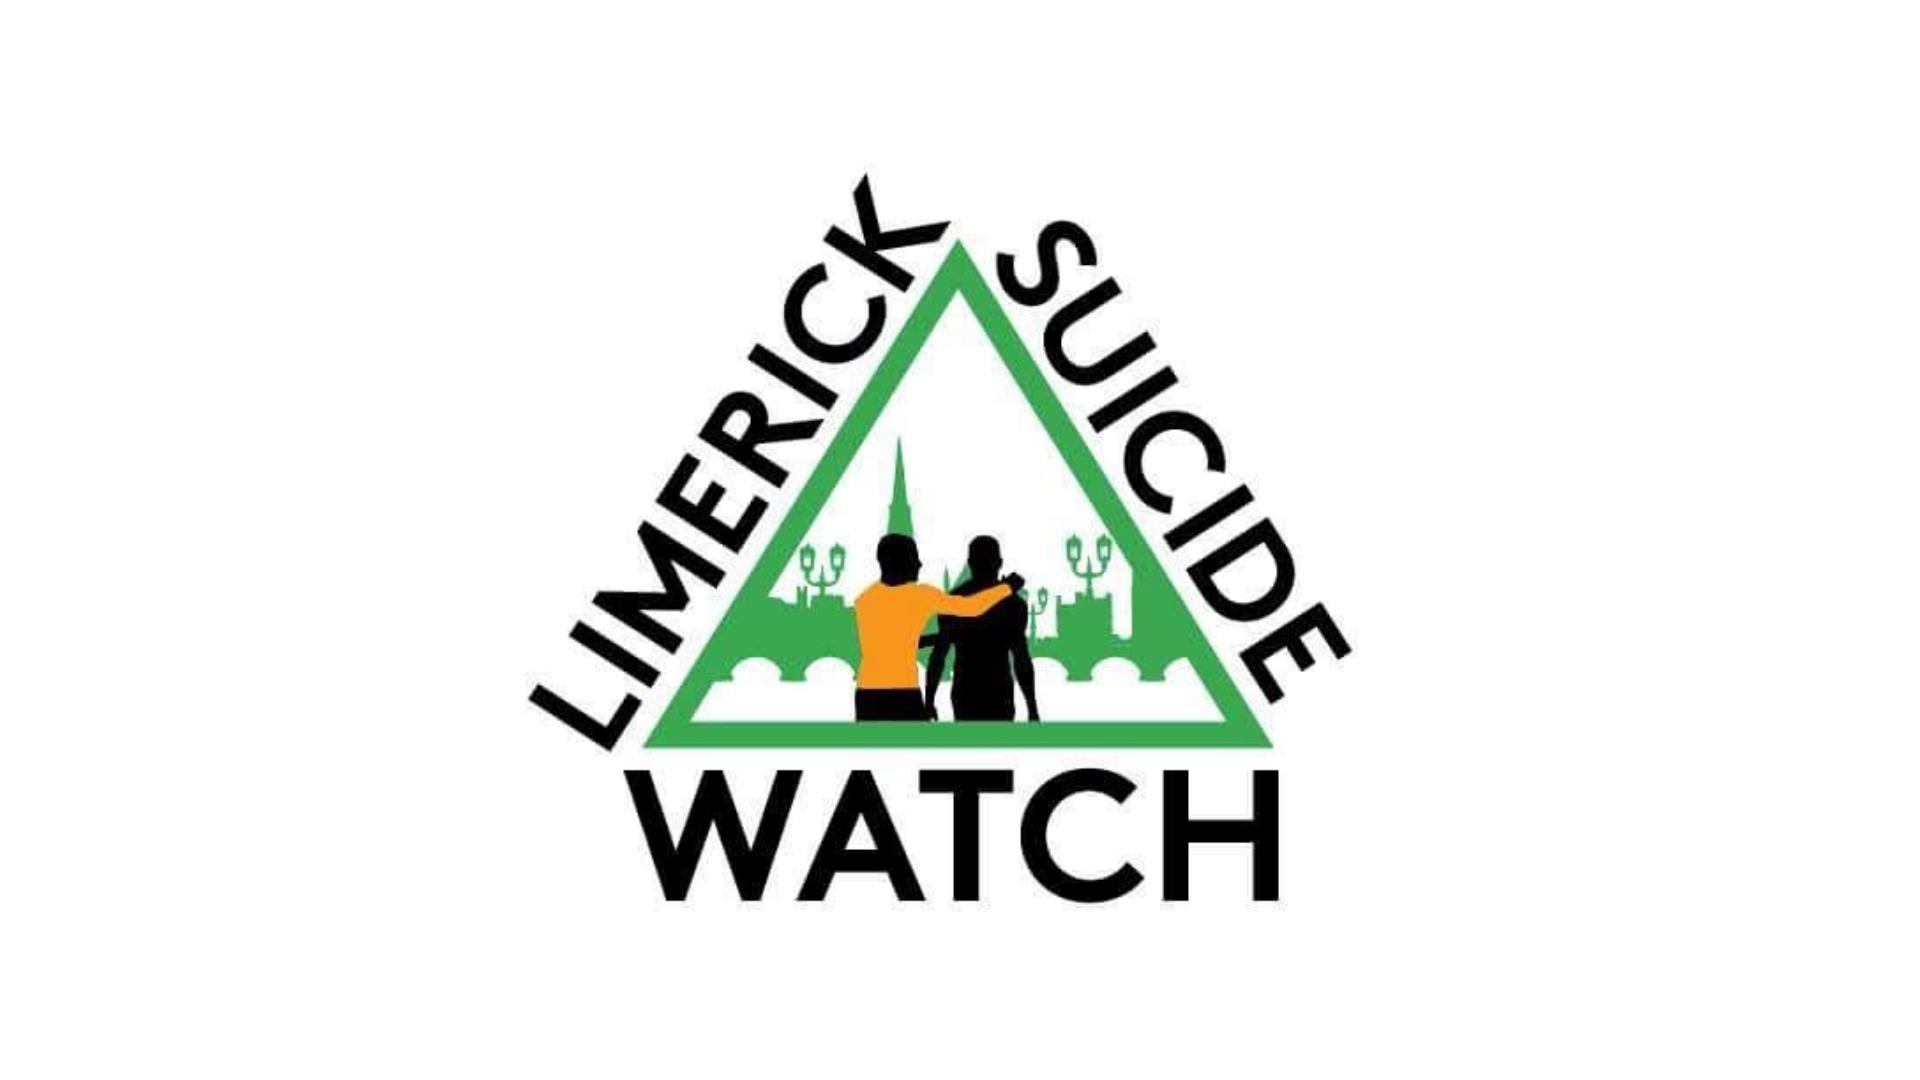 Limerick Suicide Watch